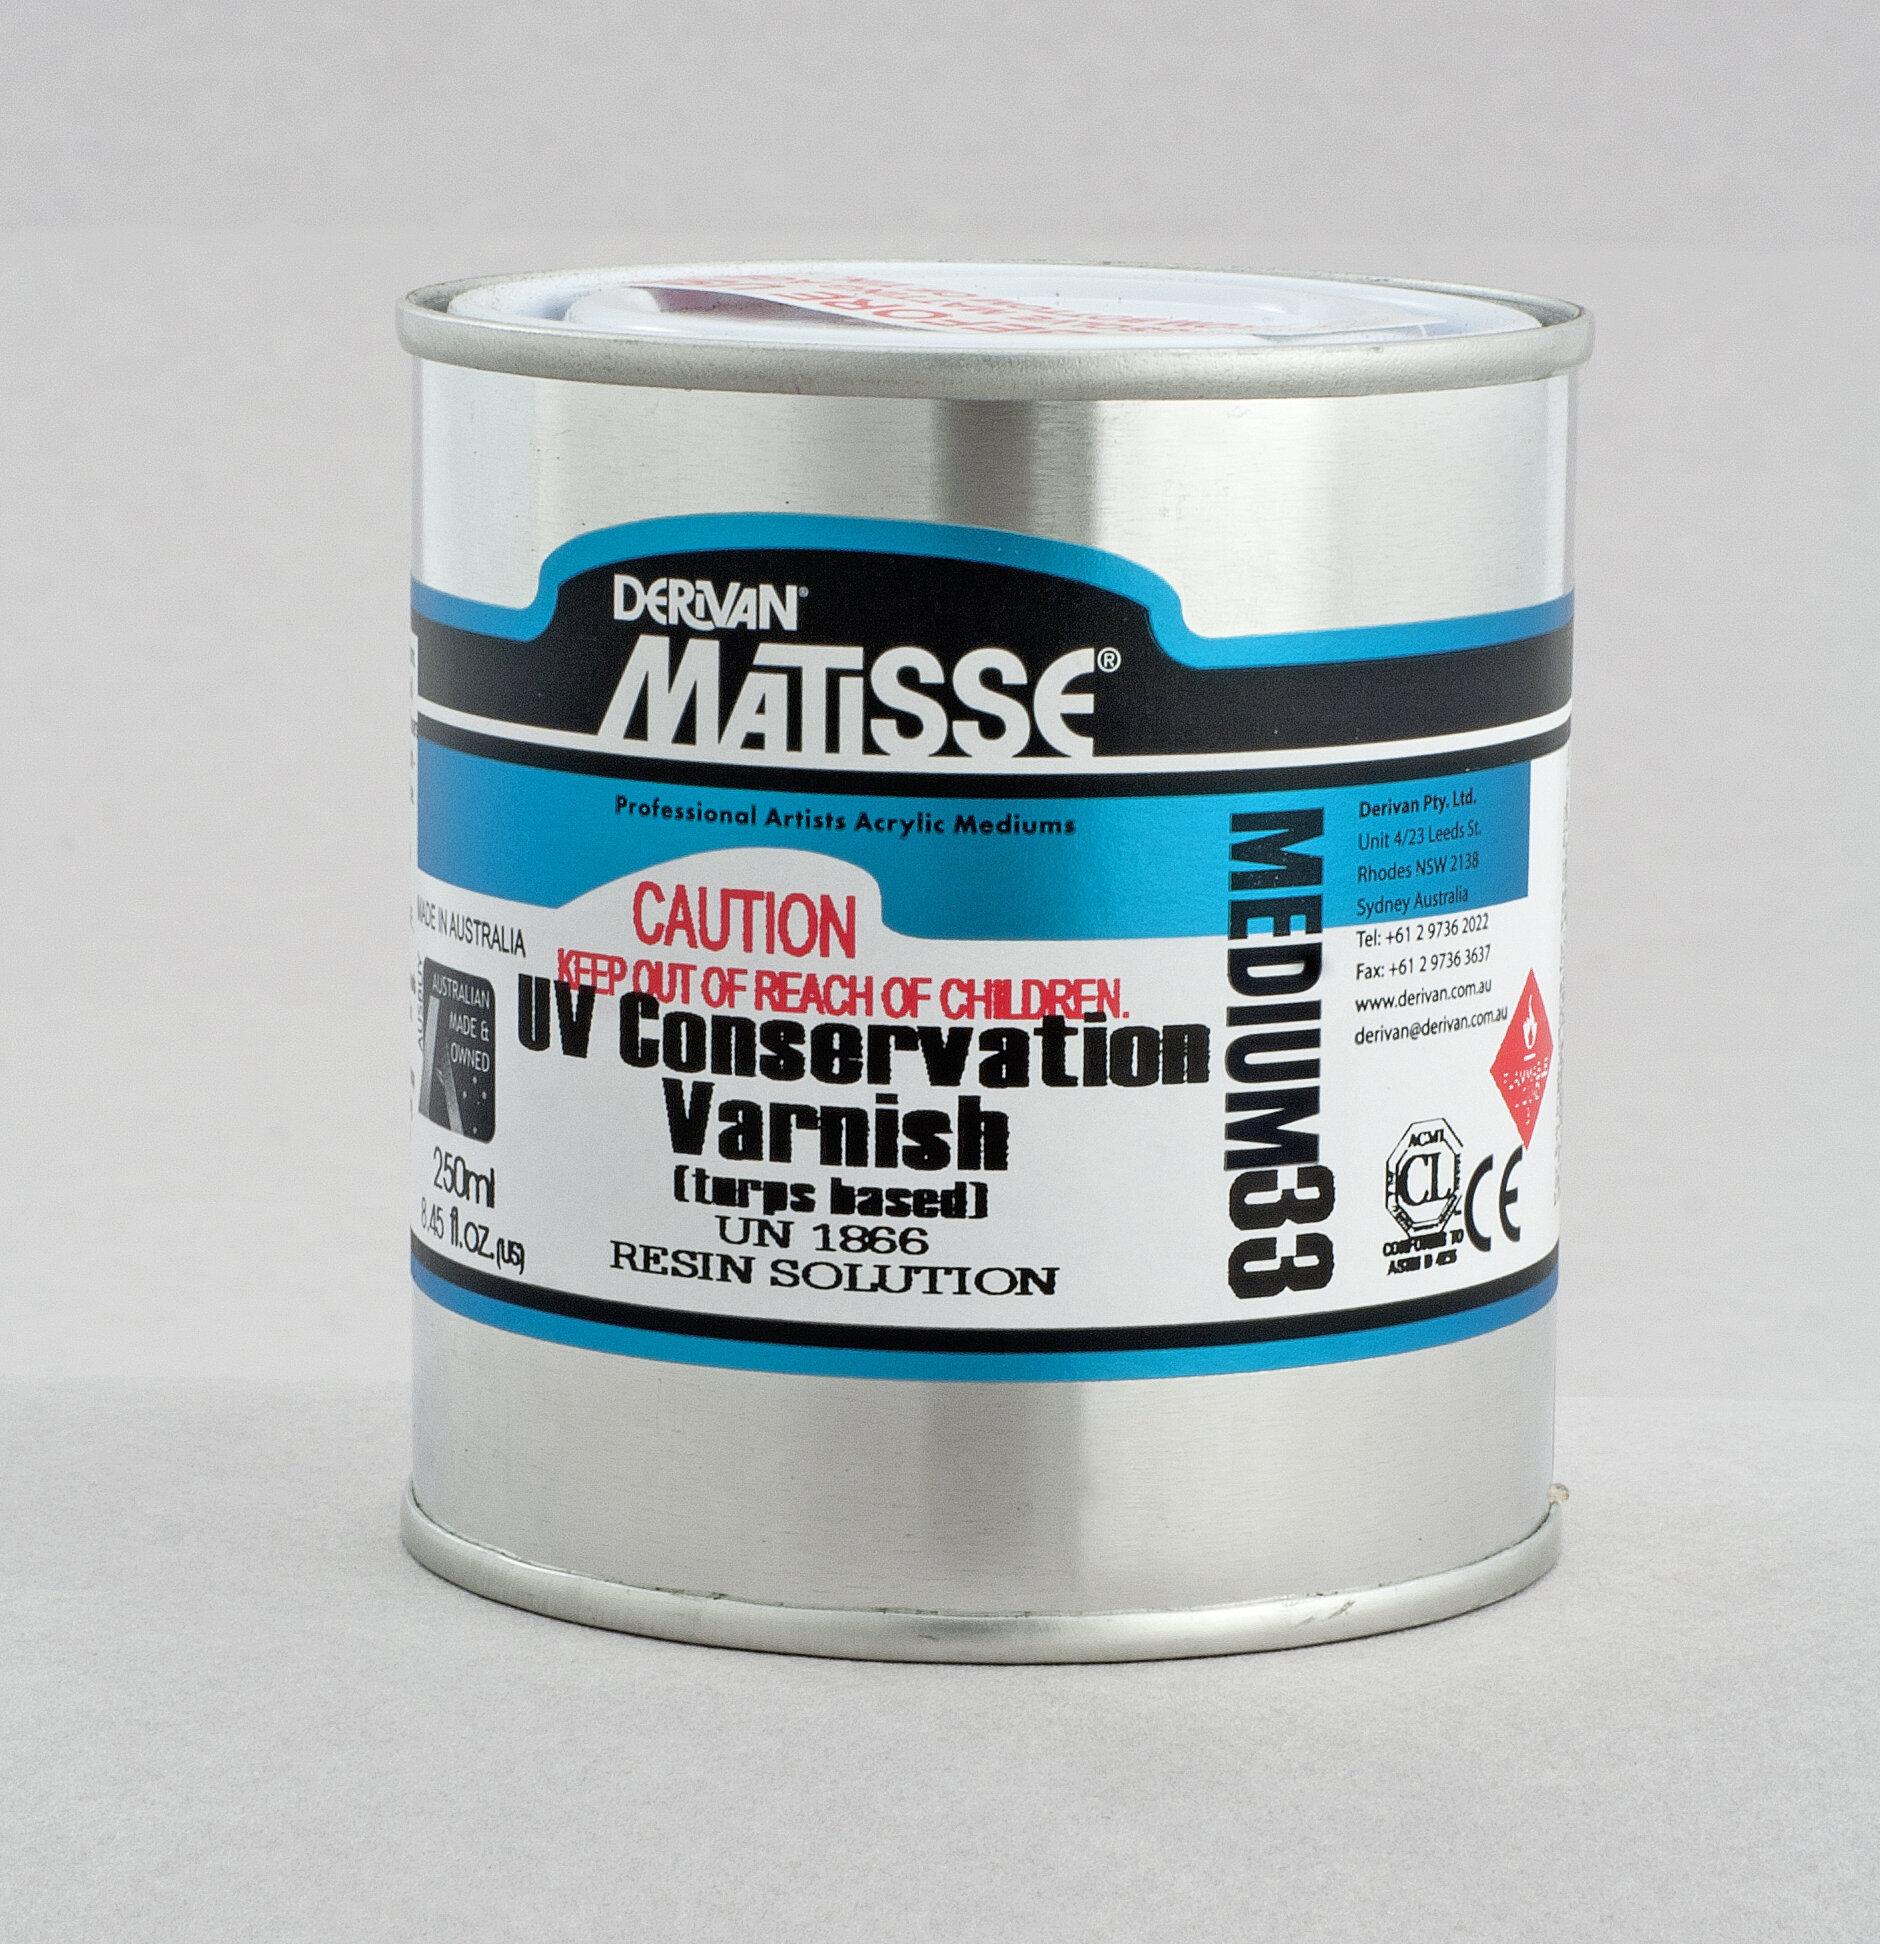 MM33 UV Conservation Varnish - ———————Non-yellowing acrylic resin varnish containing UV inhibitors. Final clear gloss finish.